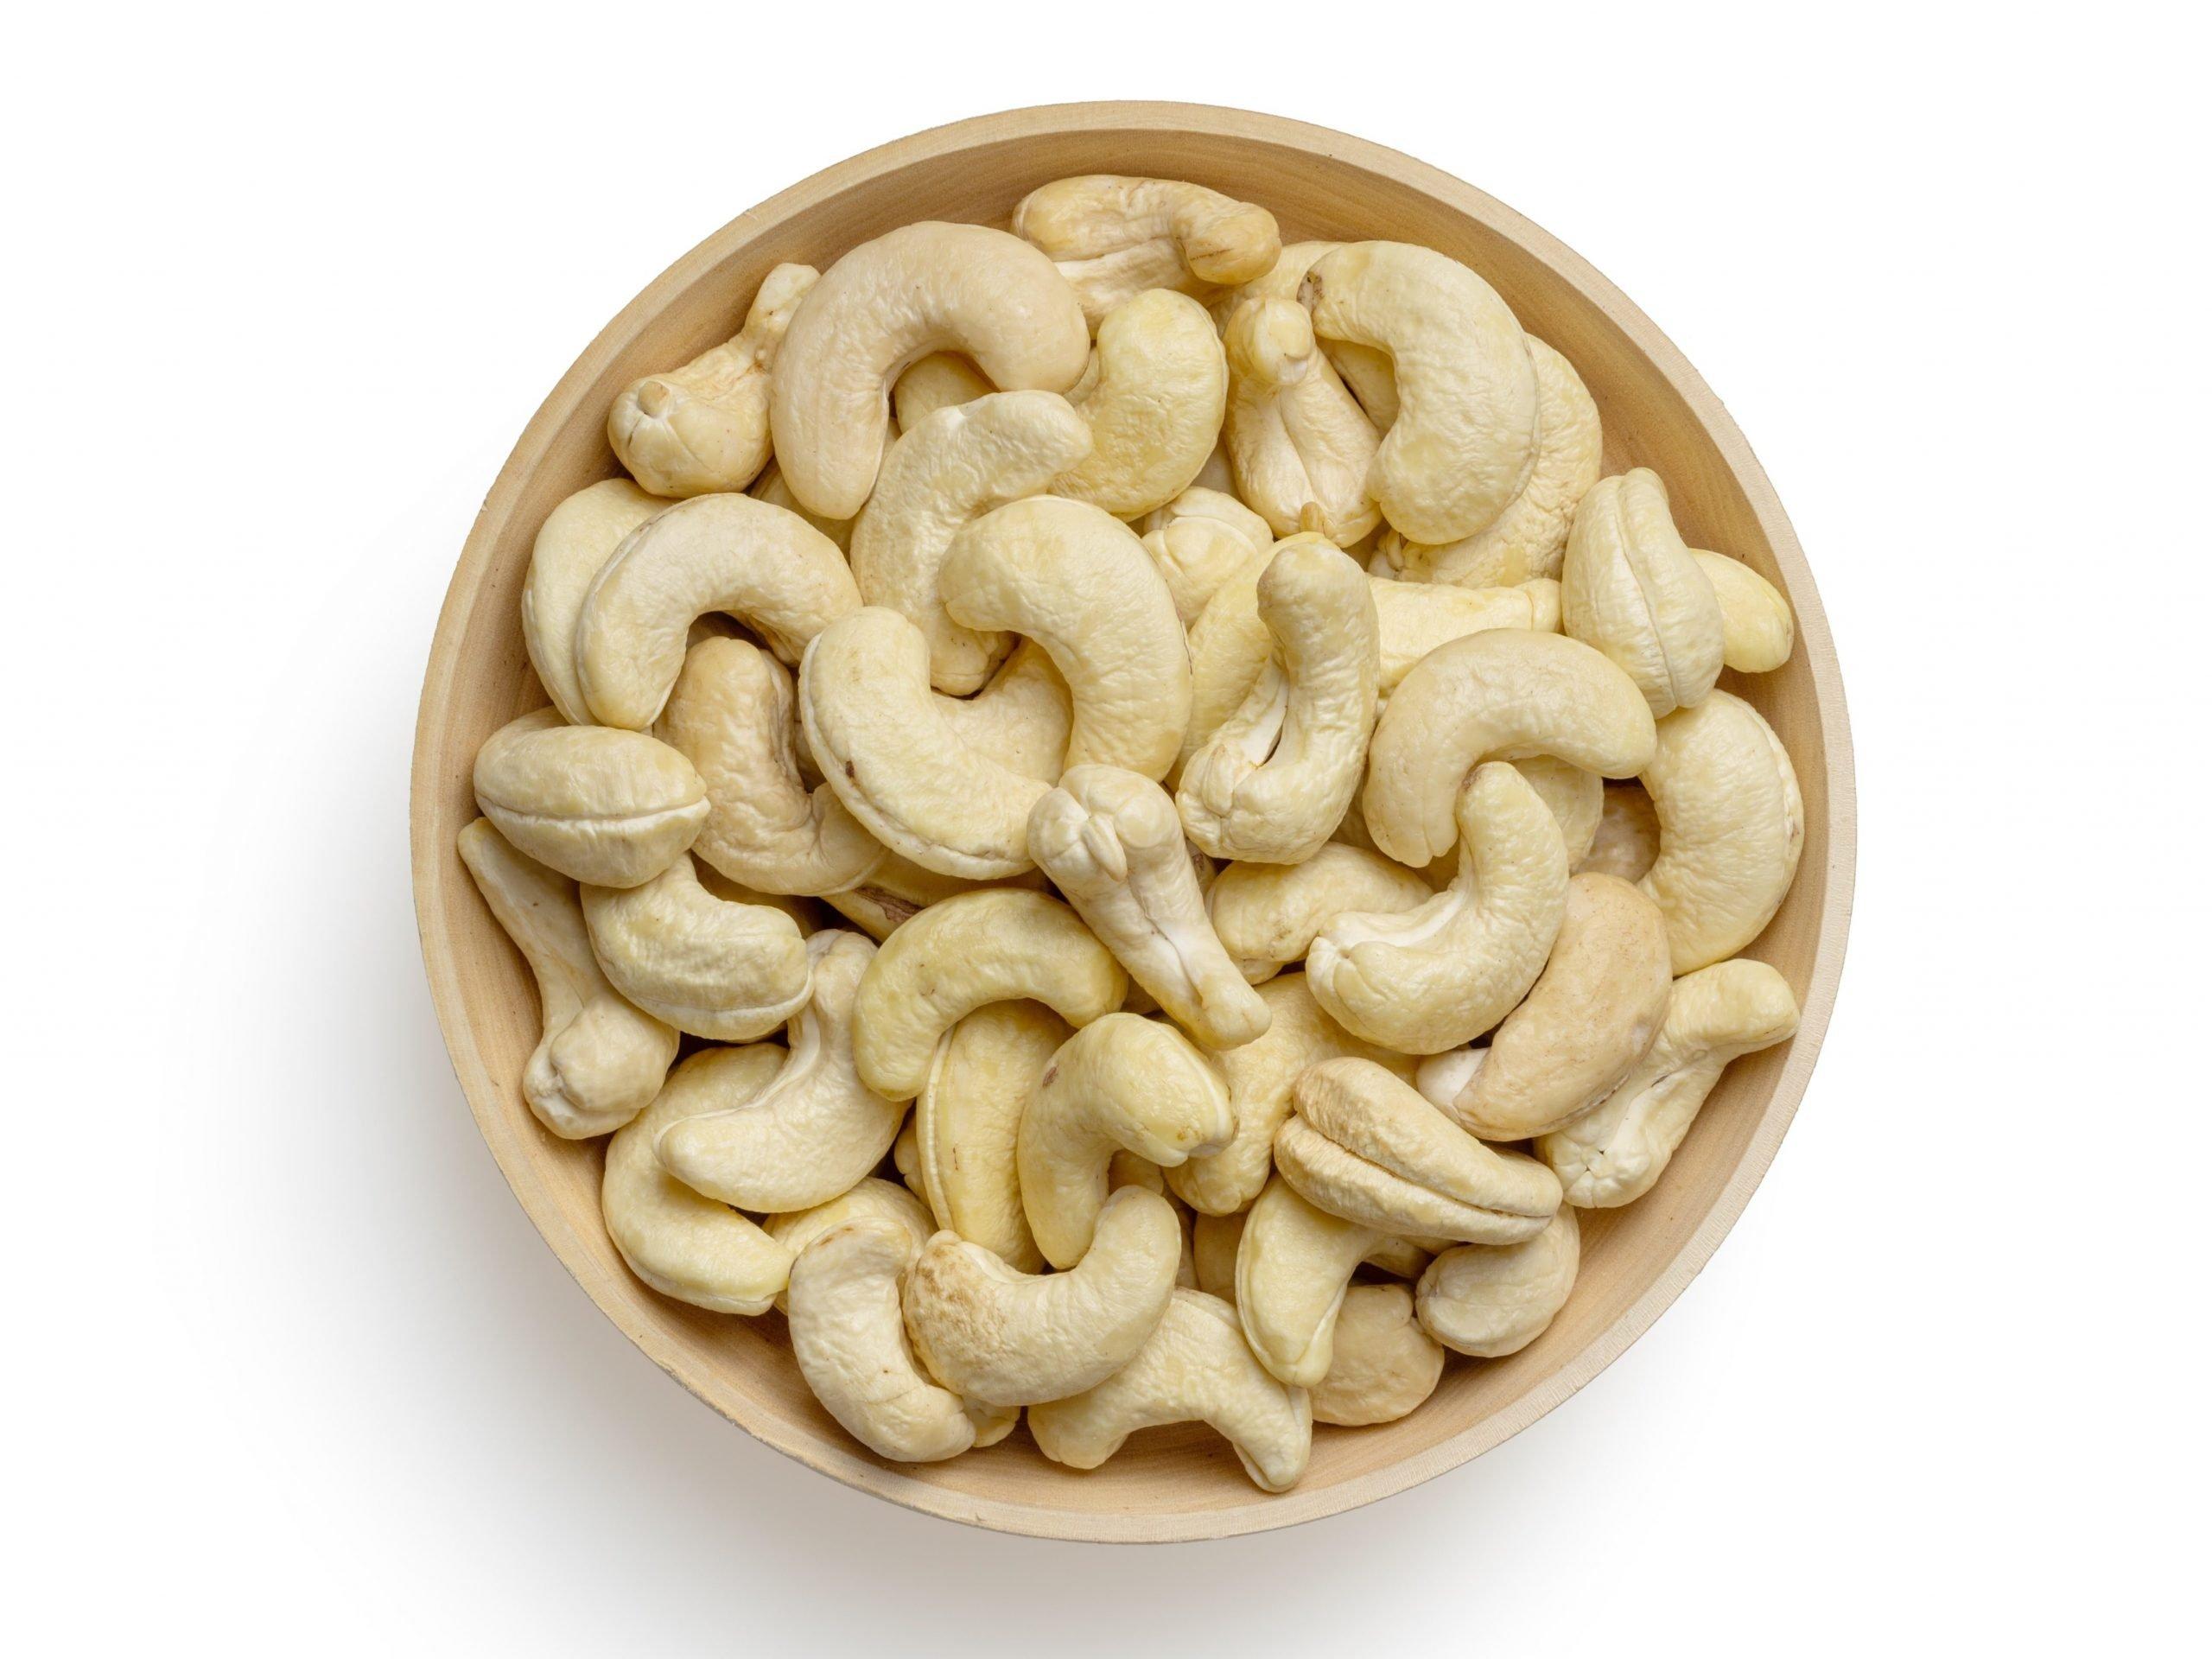 cashew nuts may kick you out of ketosis